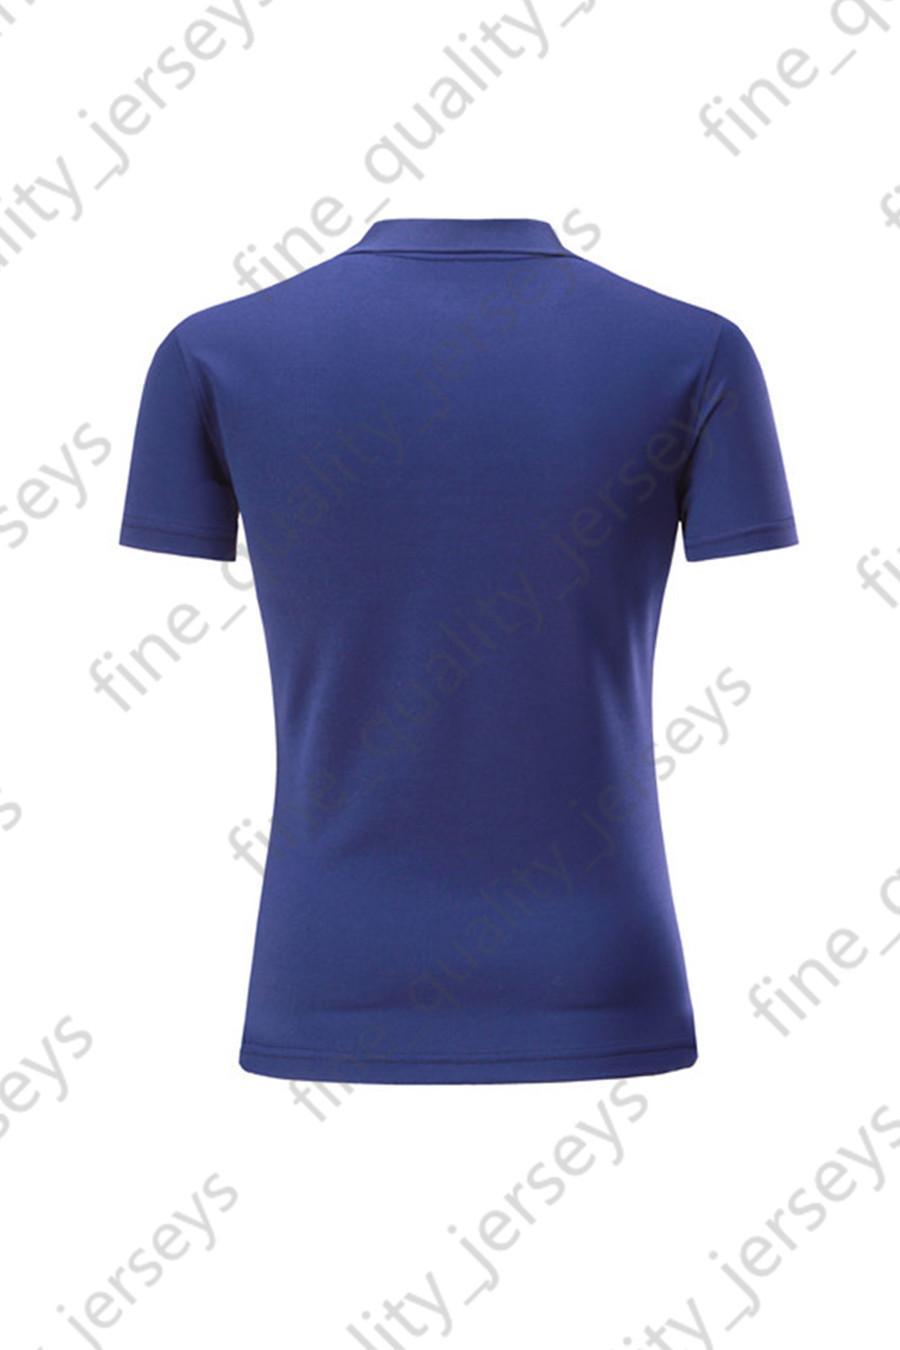 Camicie da tennis 14563333331 VGGJ